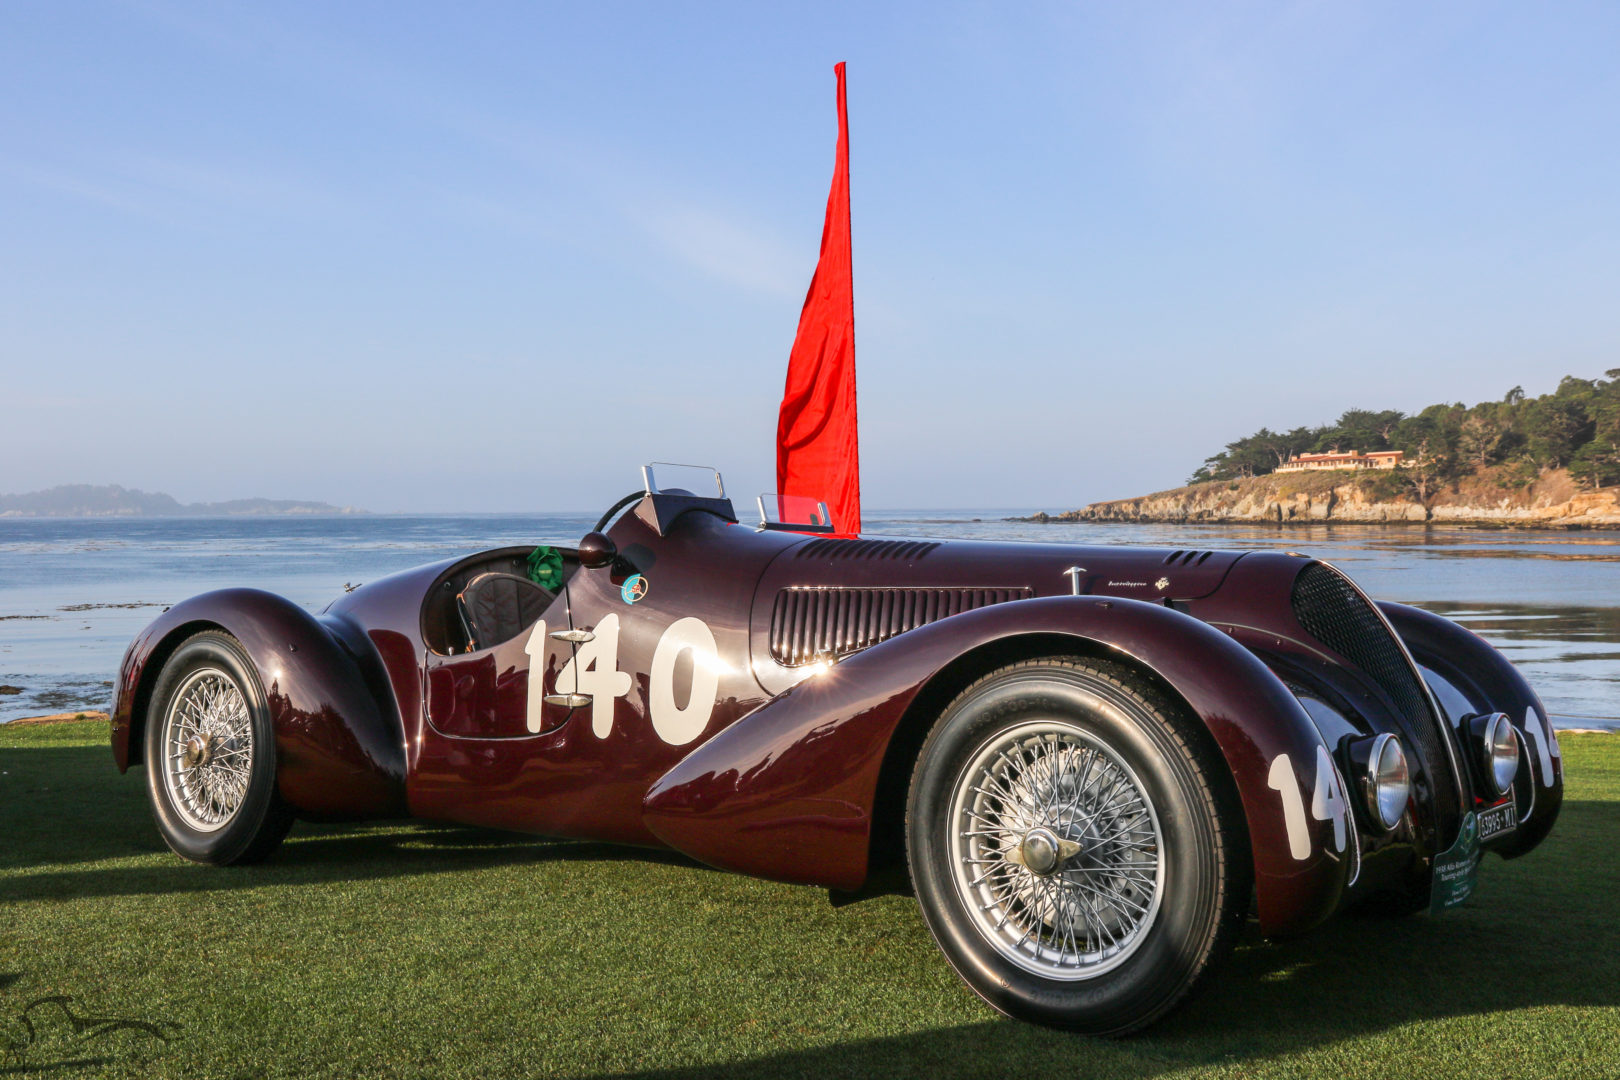 2015 Pebble Beach Concours d'Elegance - Alfa Romeo 6C 2300B MM Spider Corsa